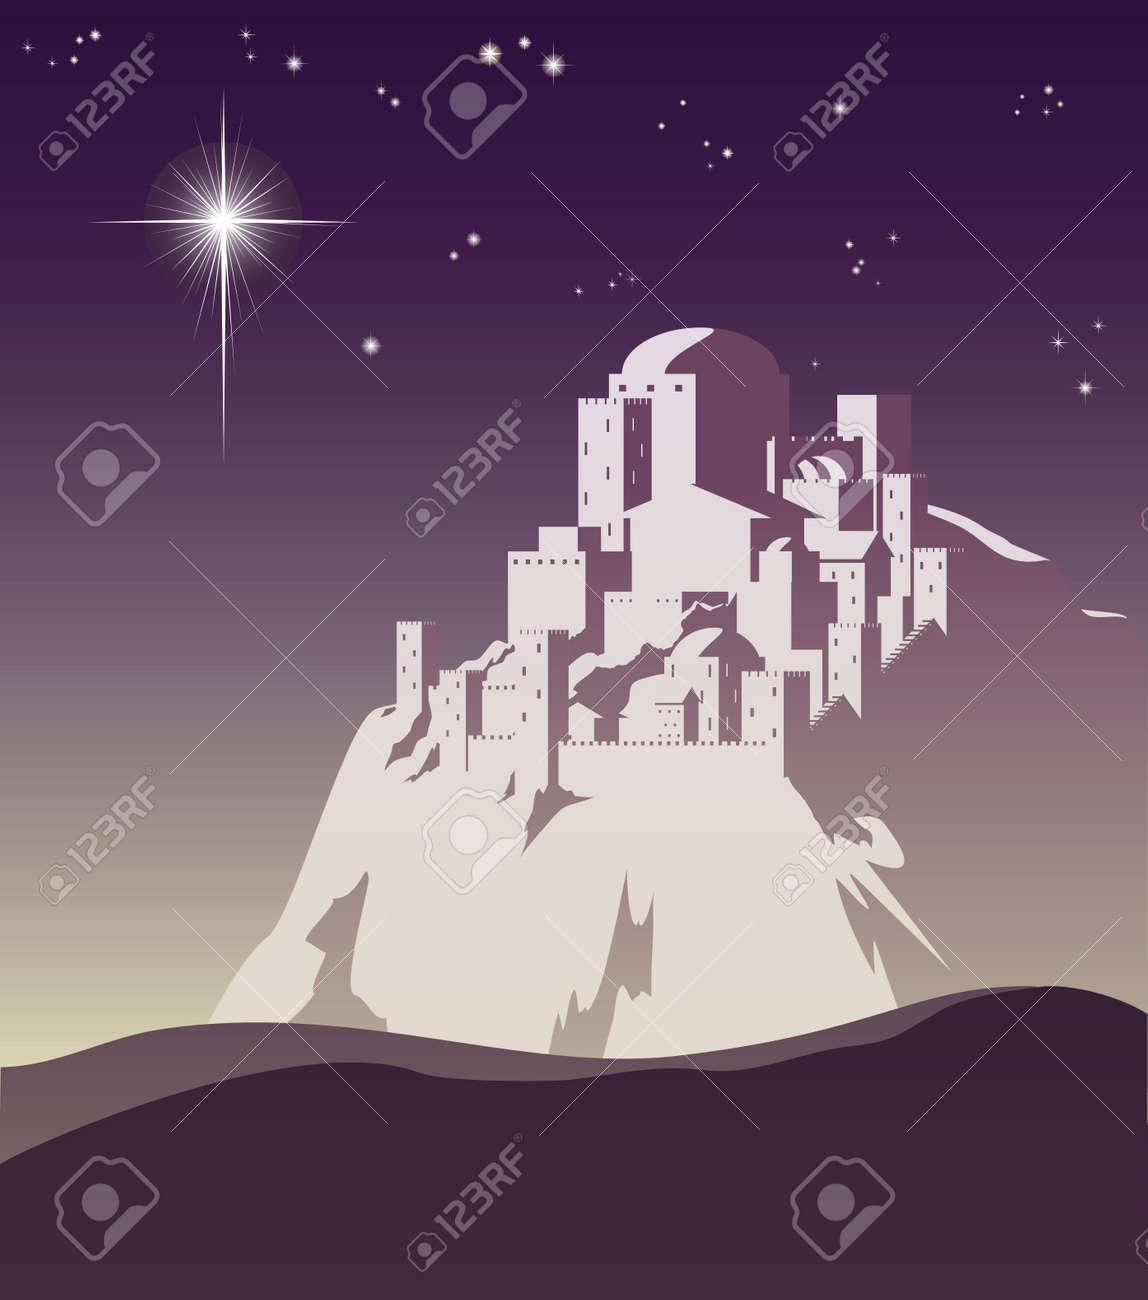 Illustration of Christmas star over Bethlehem announcing the birth of Jesus Stock Vector - 10387833